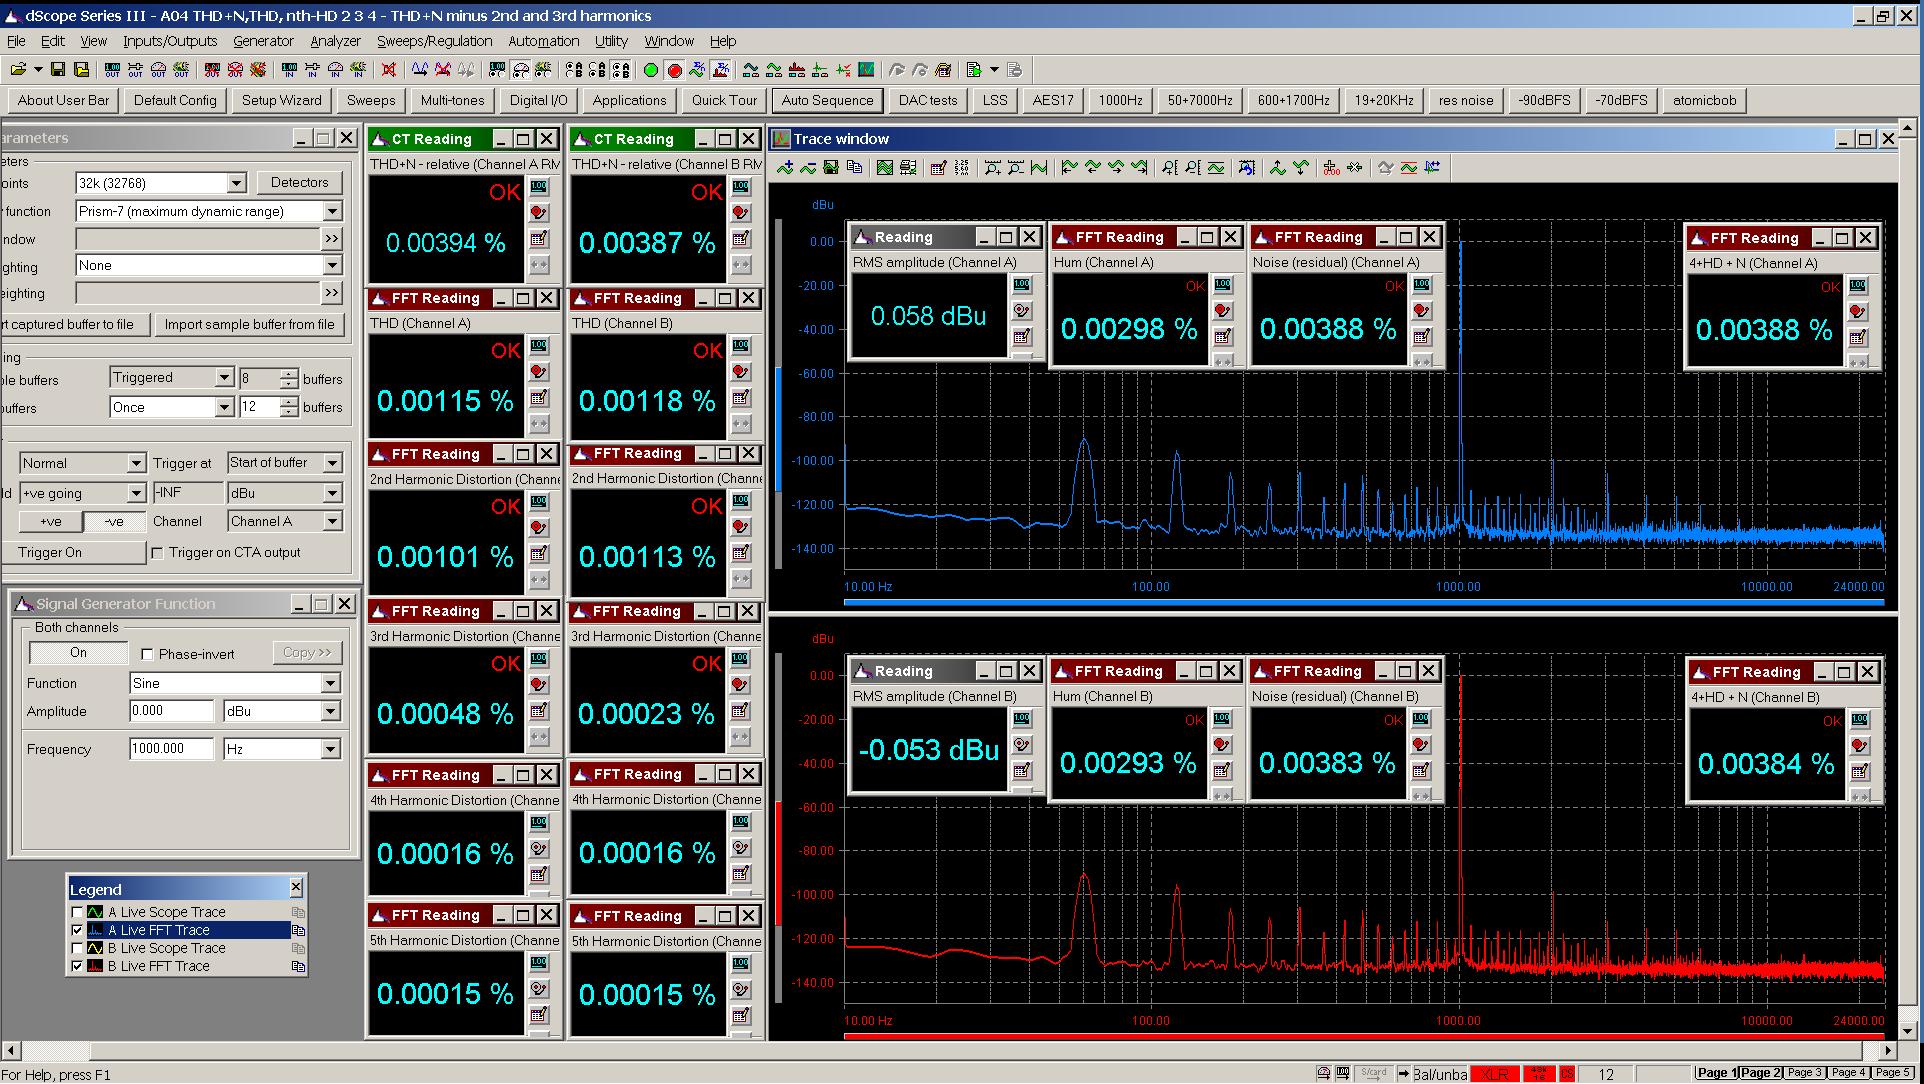 20190923 LAuX A04 THD+N  THD  nth-HD FFT 300R SE - 4+HD+N with 60Hz.png